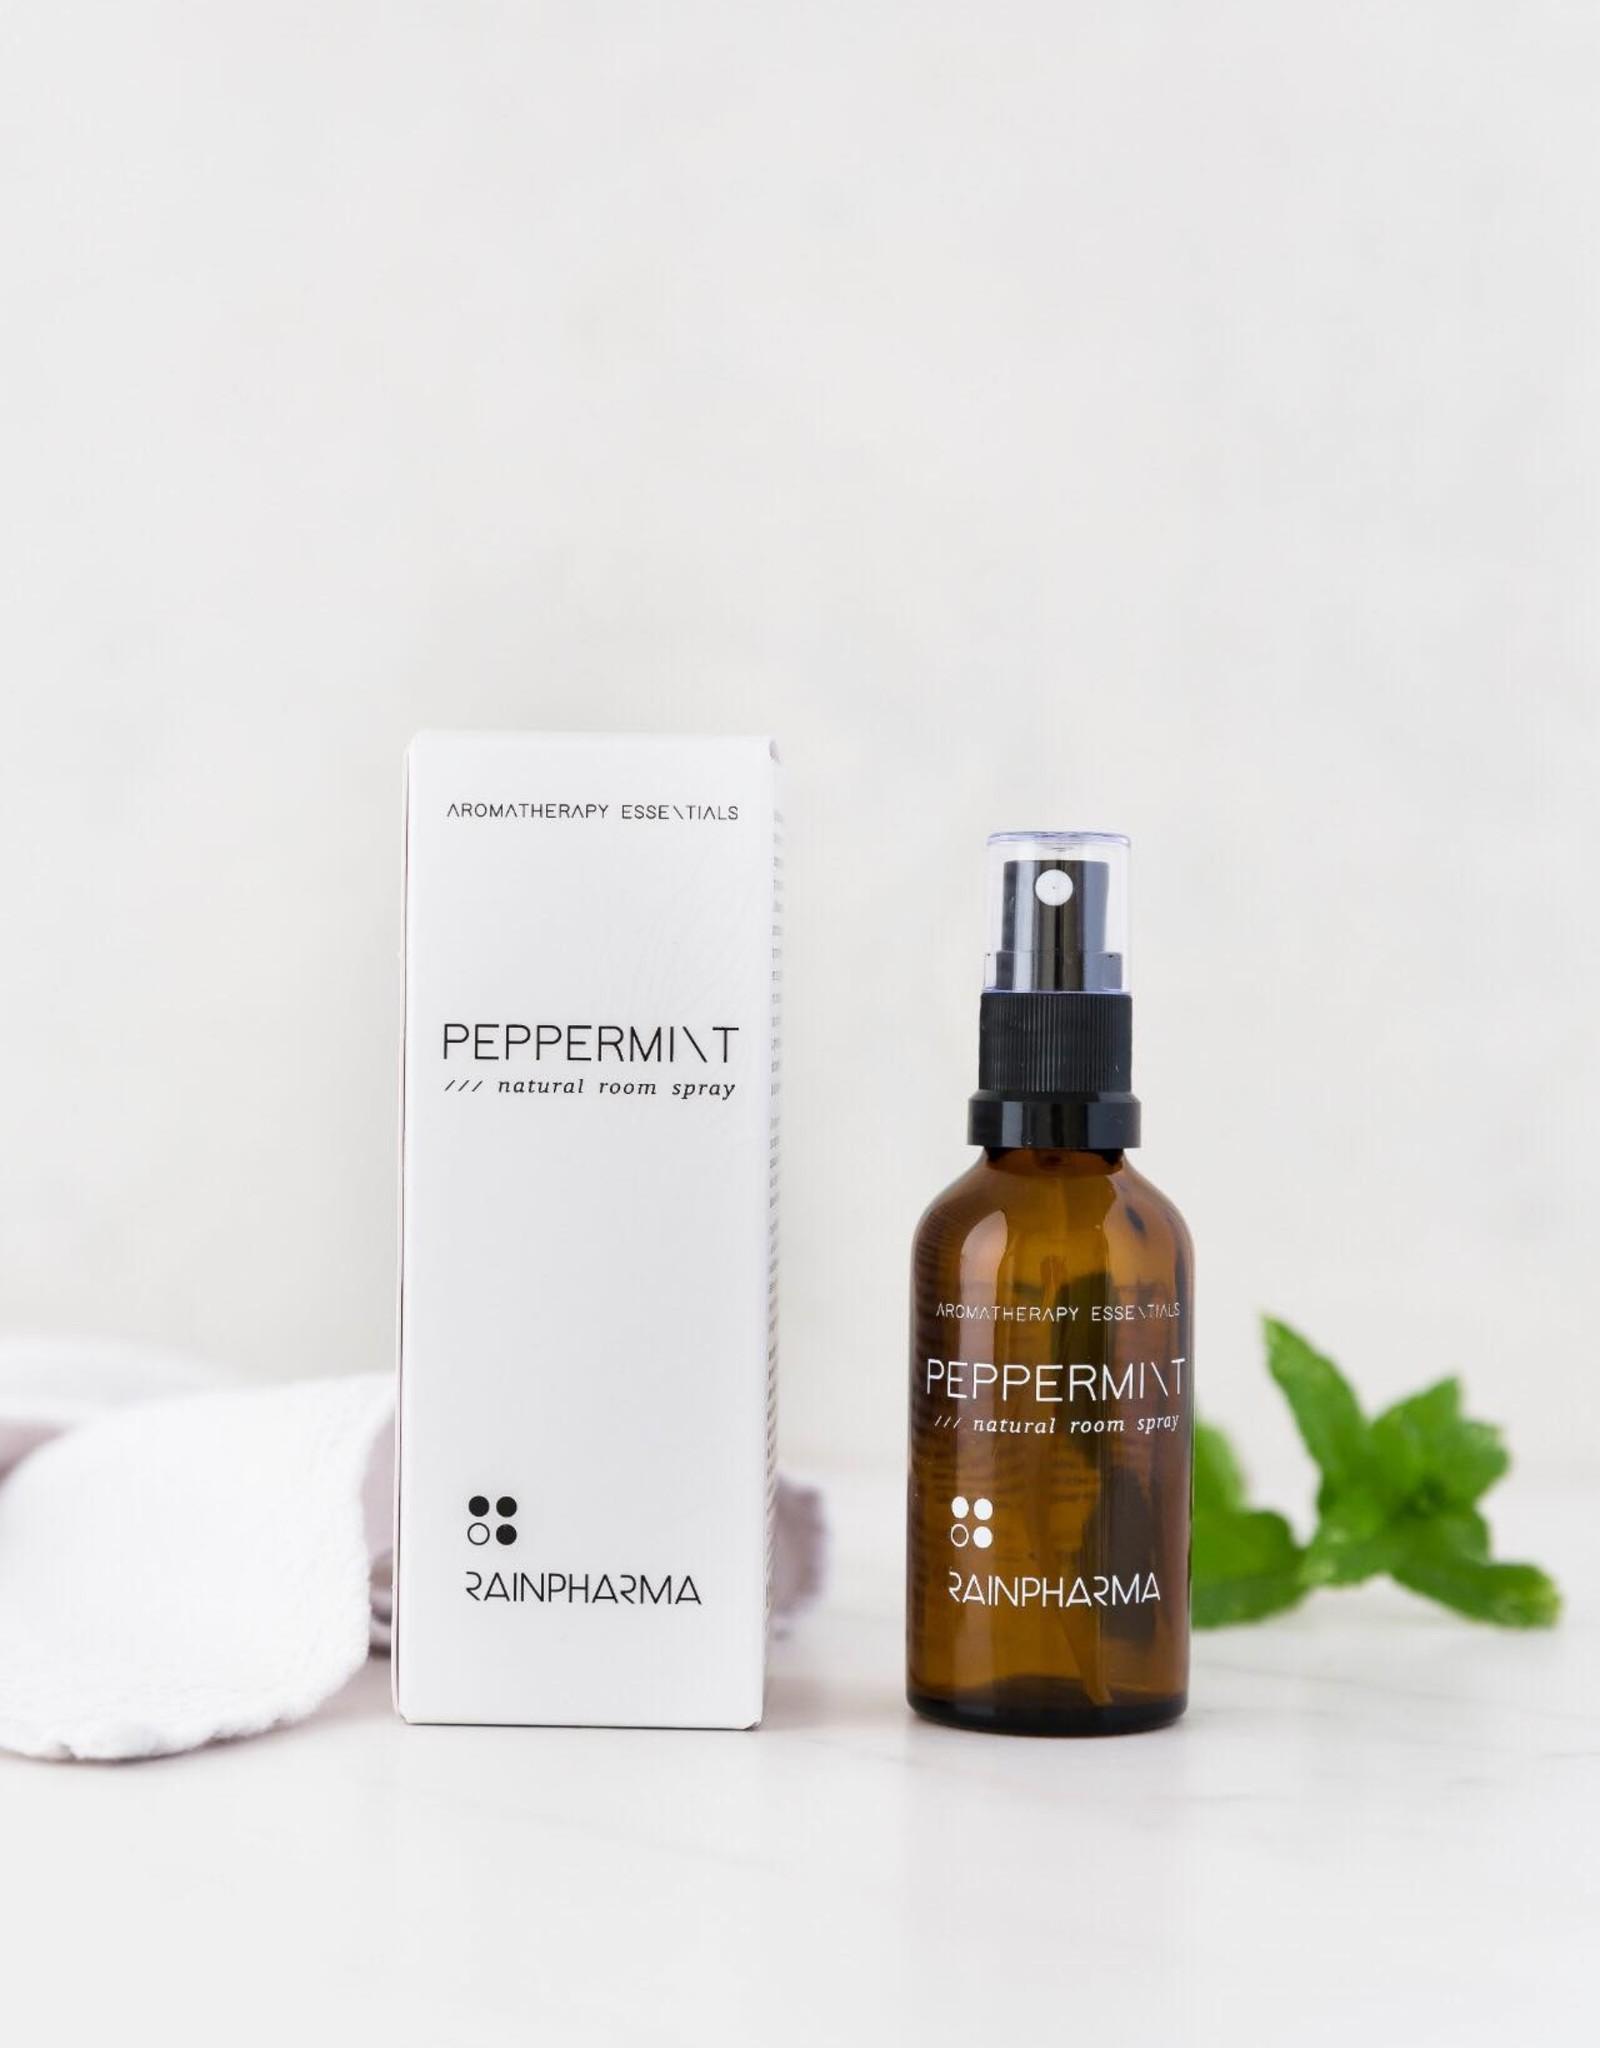 RainPharma Natural Room Spray Peppermint 50ml - Rainpharma